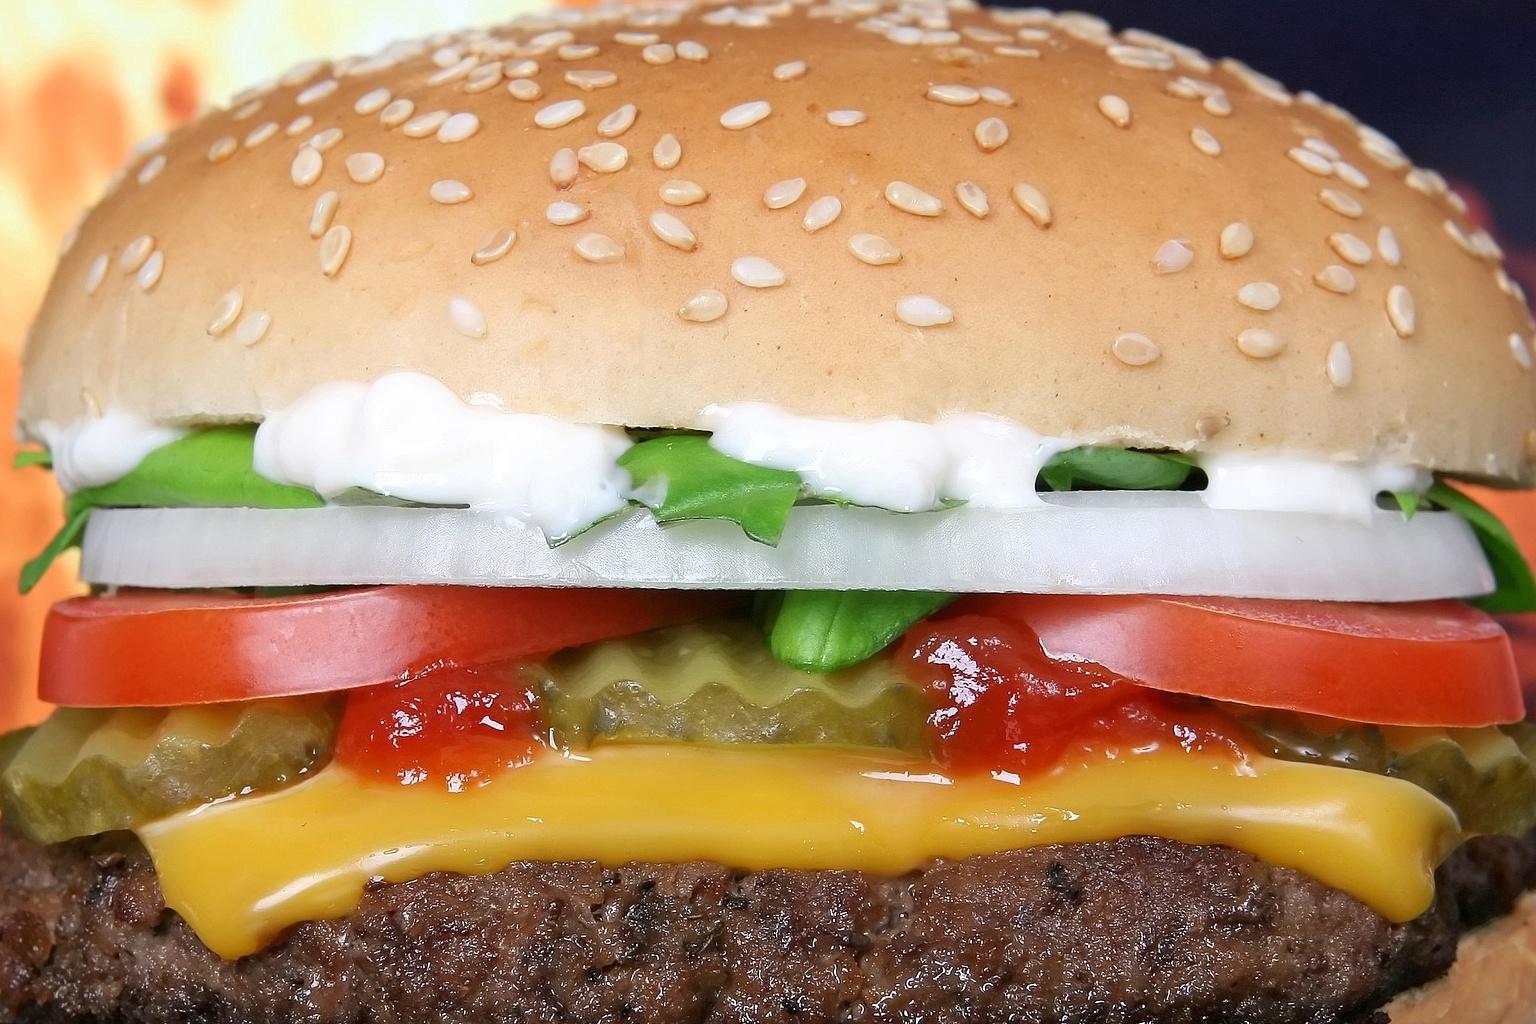 McDonalds Cropped